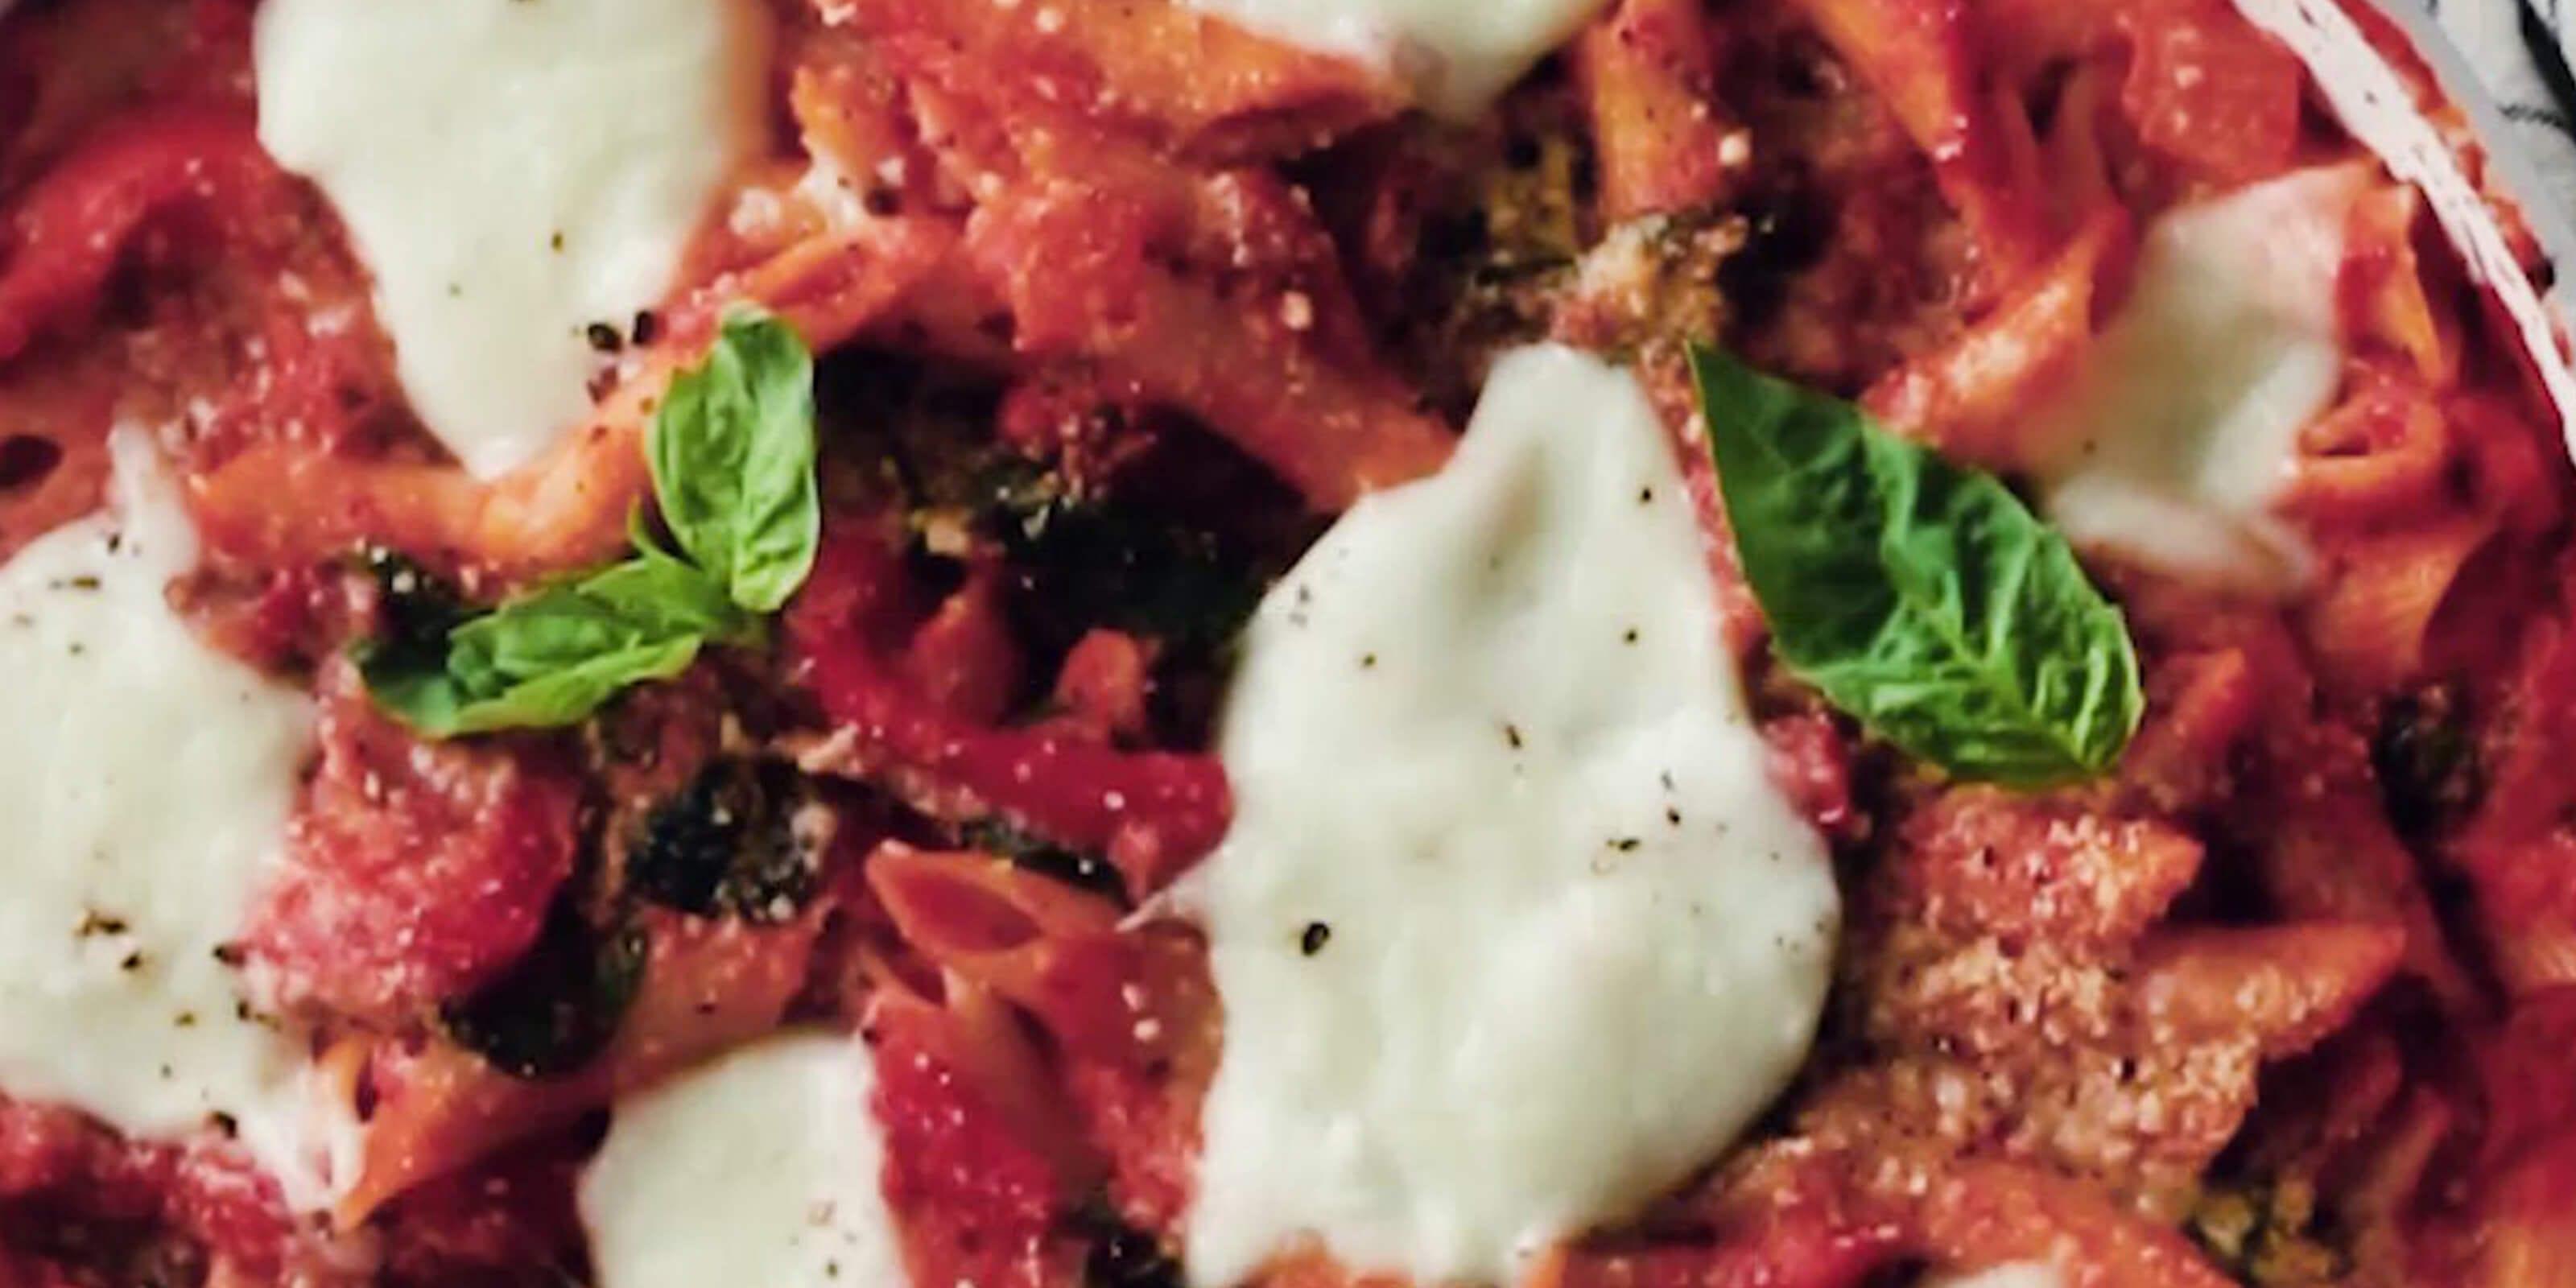 creamy tomato basil pasta bake